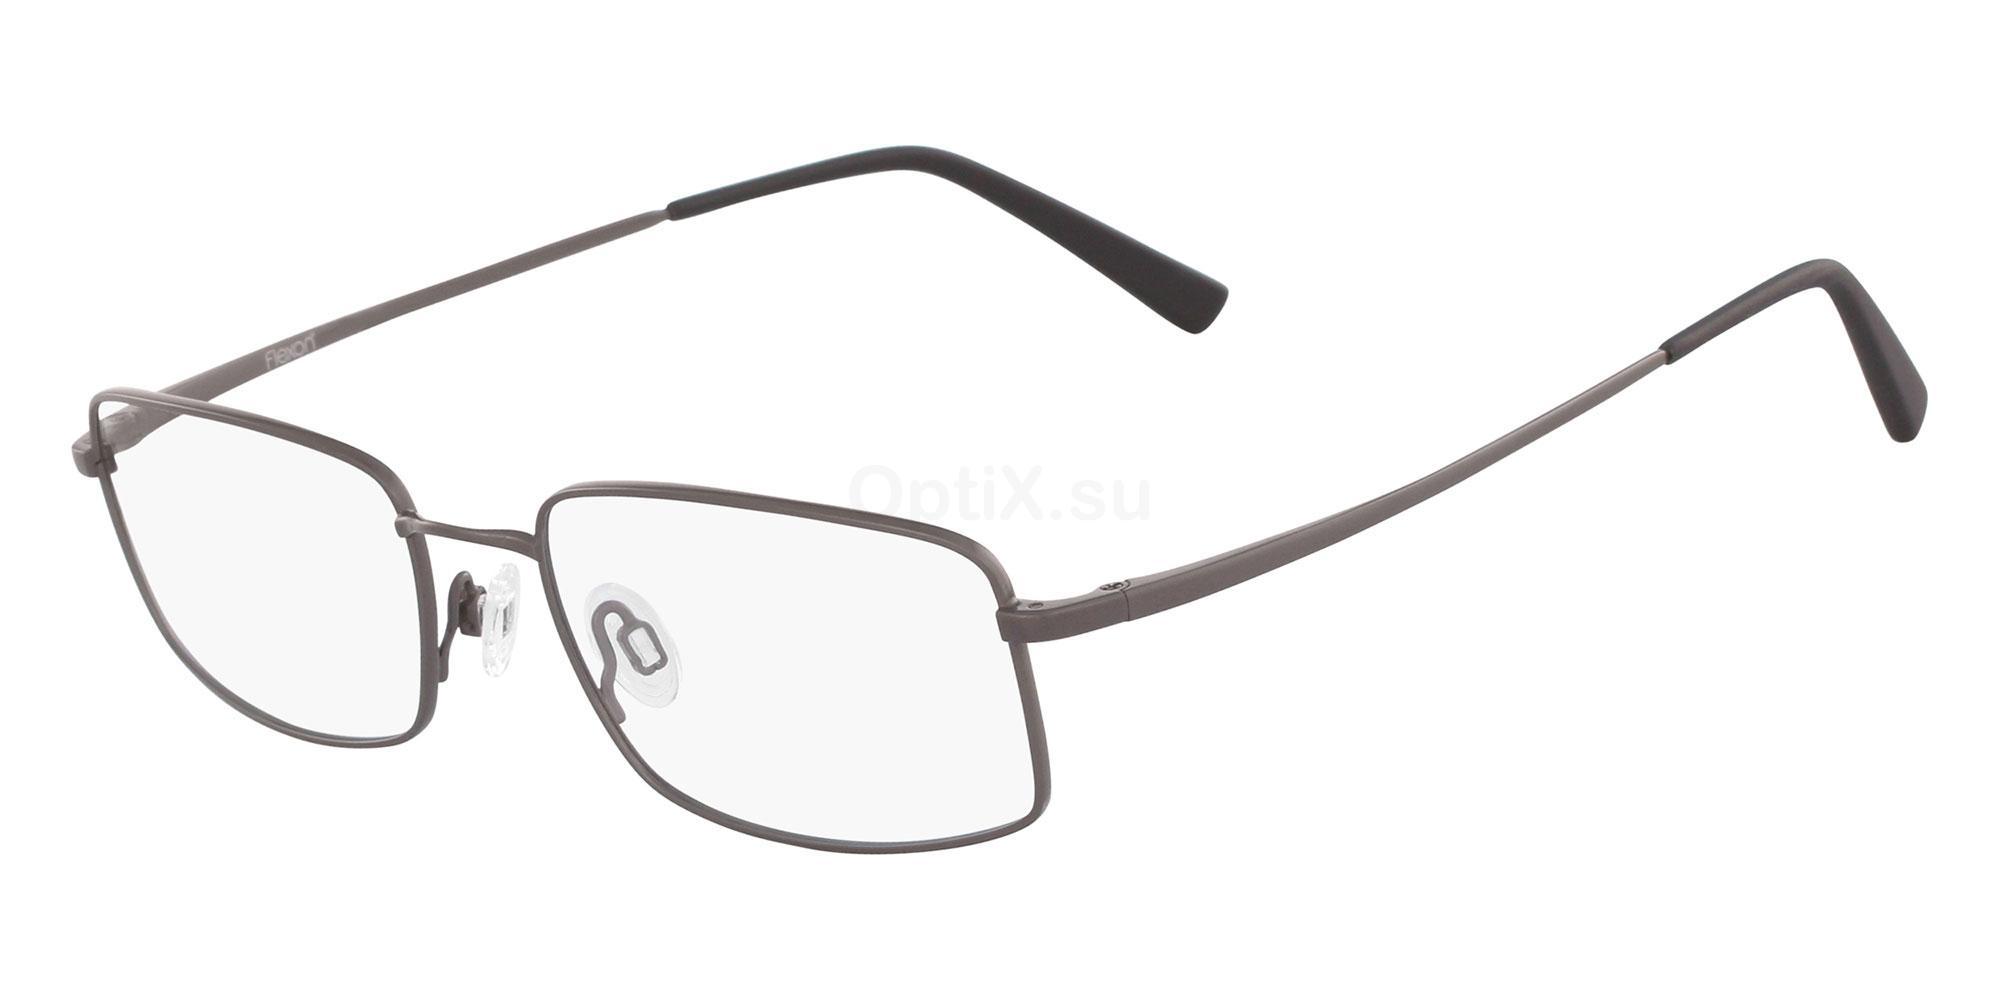 033 FLEXON JULIAN 600 Glasses, Flexon